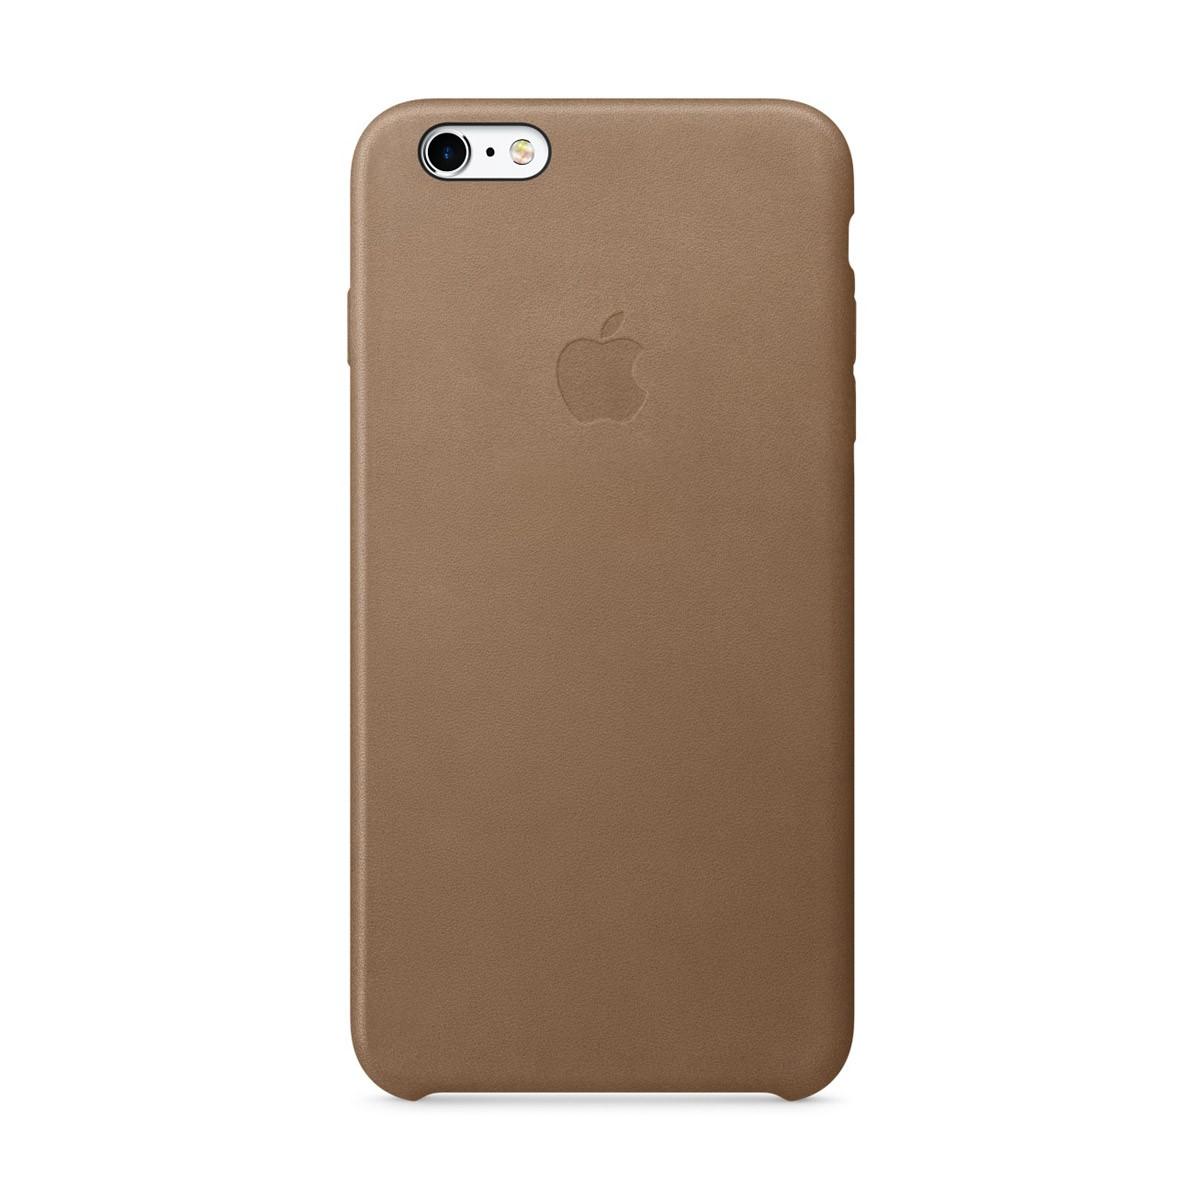 Apple kožený kryt na iPhone 6s Plus - hnědý